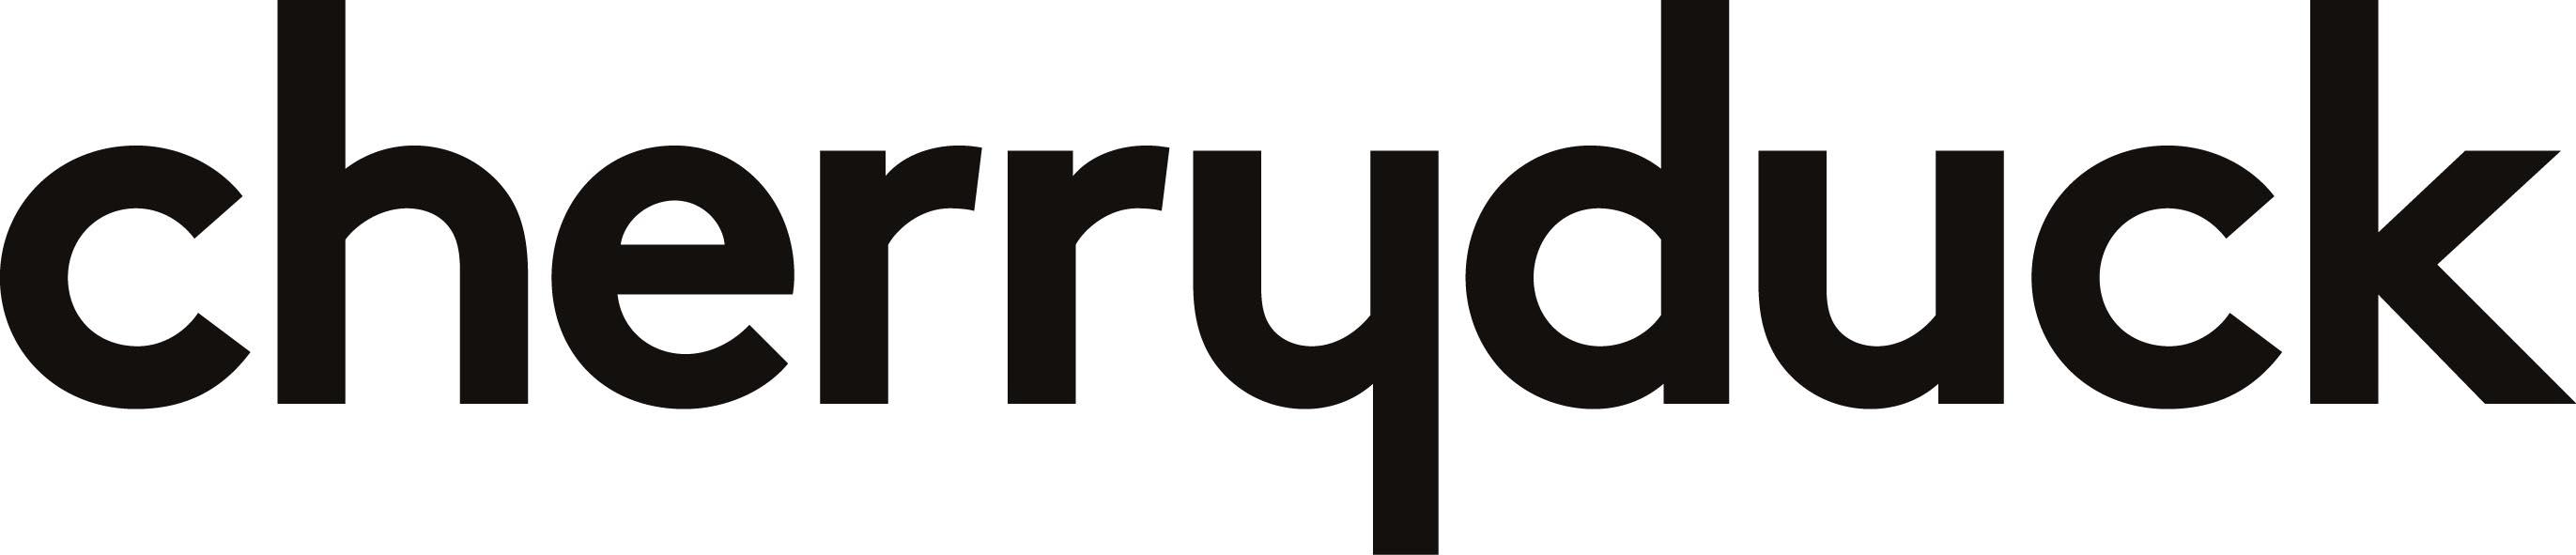 Cherryduck Logotype Black